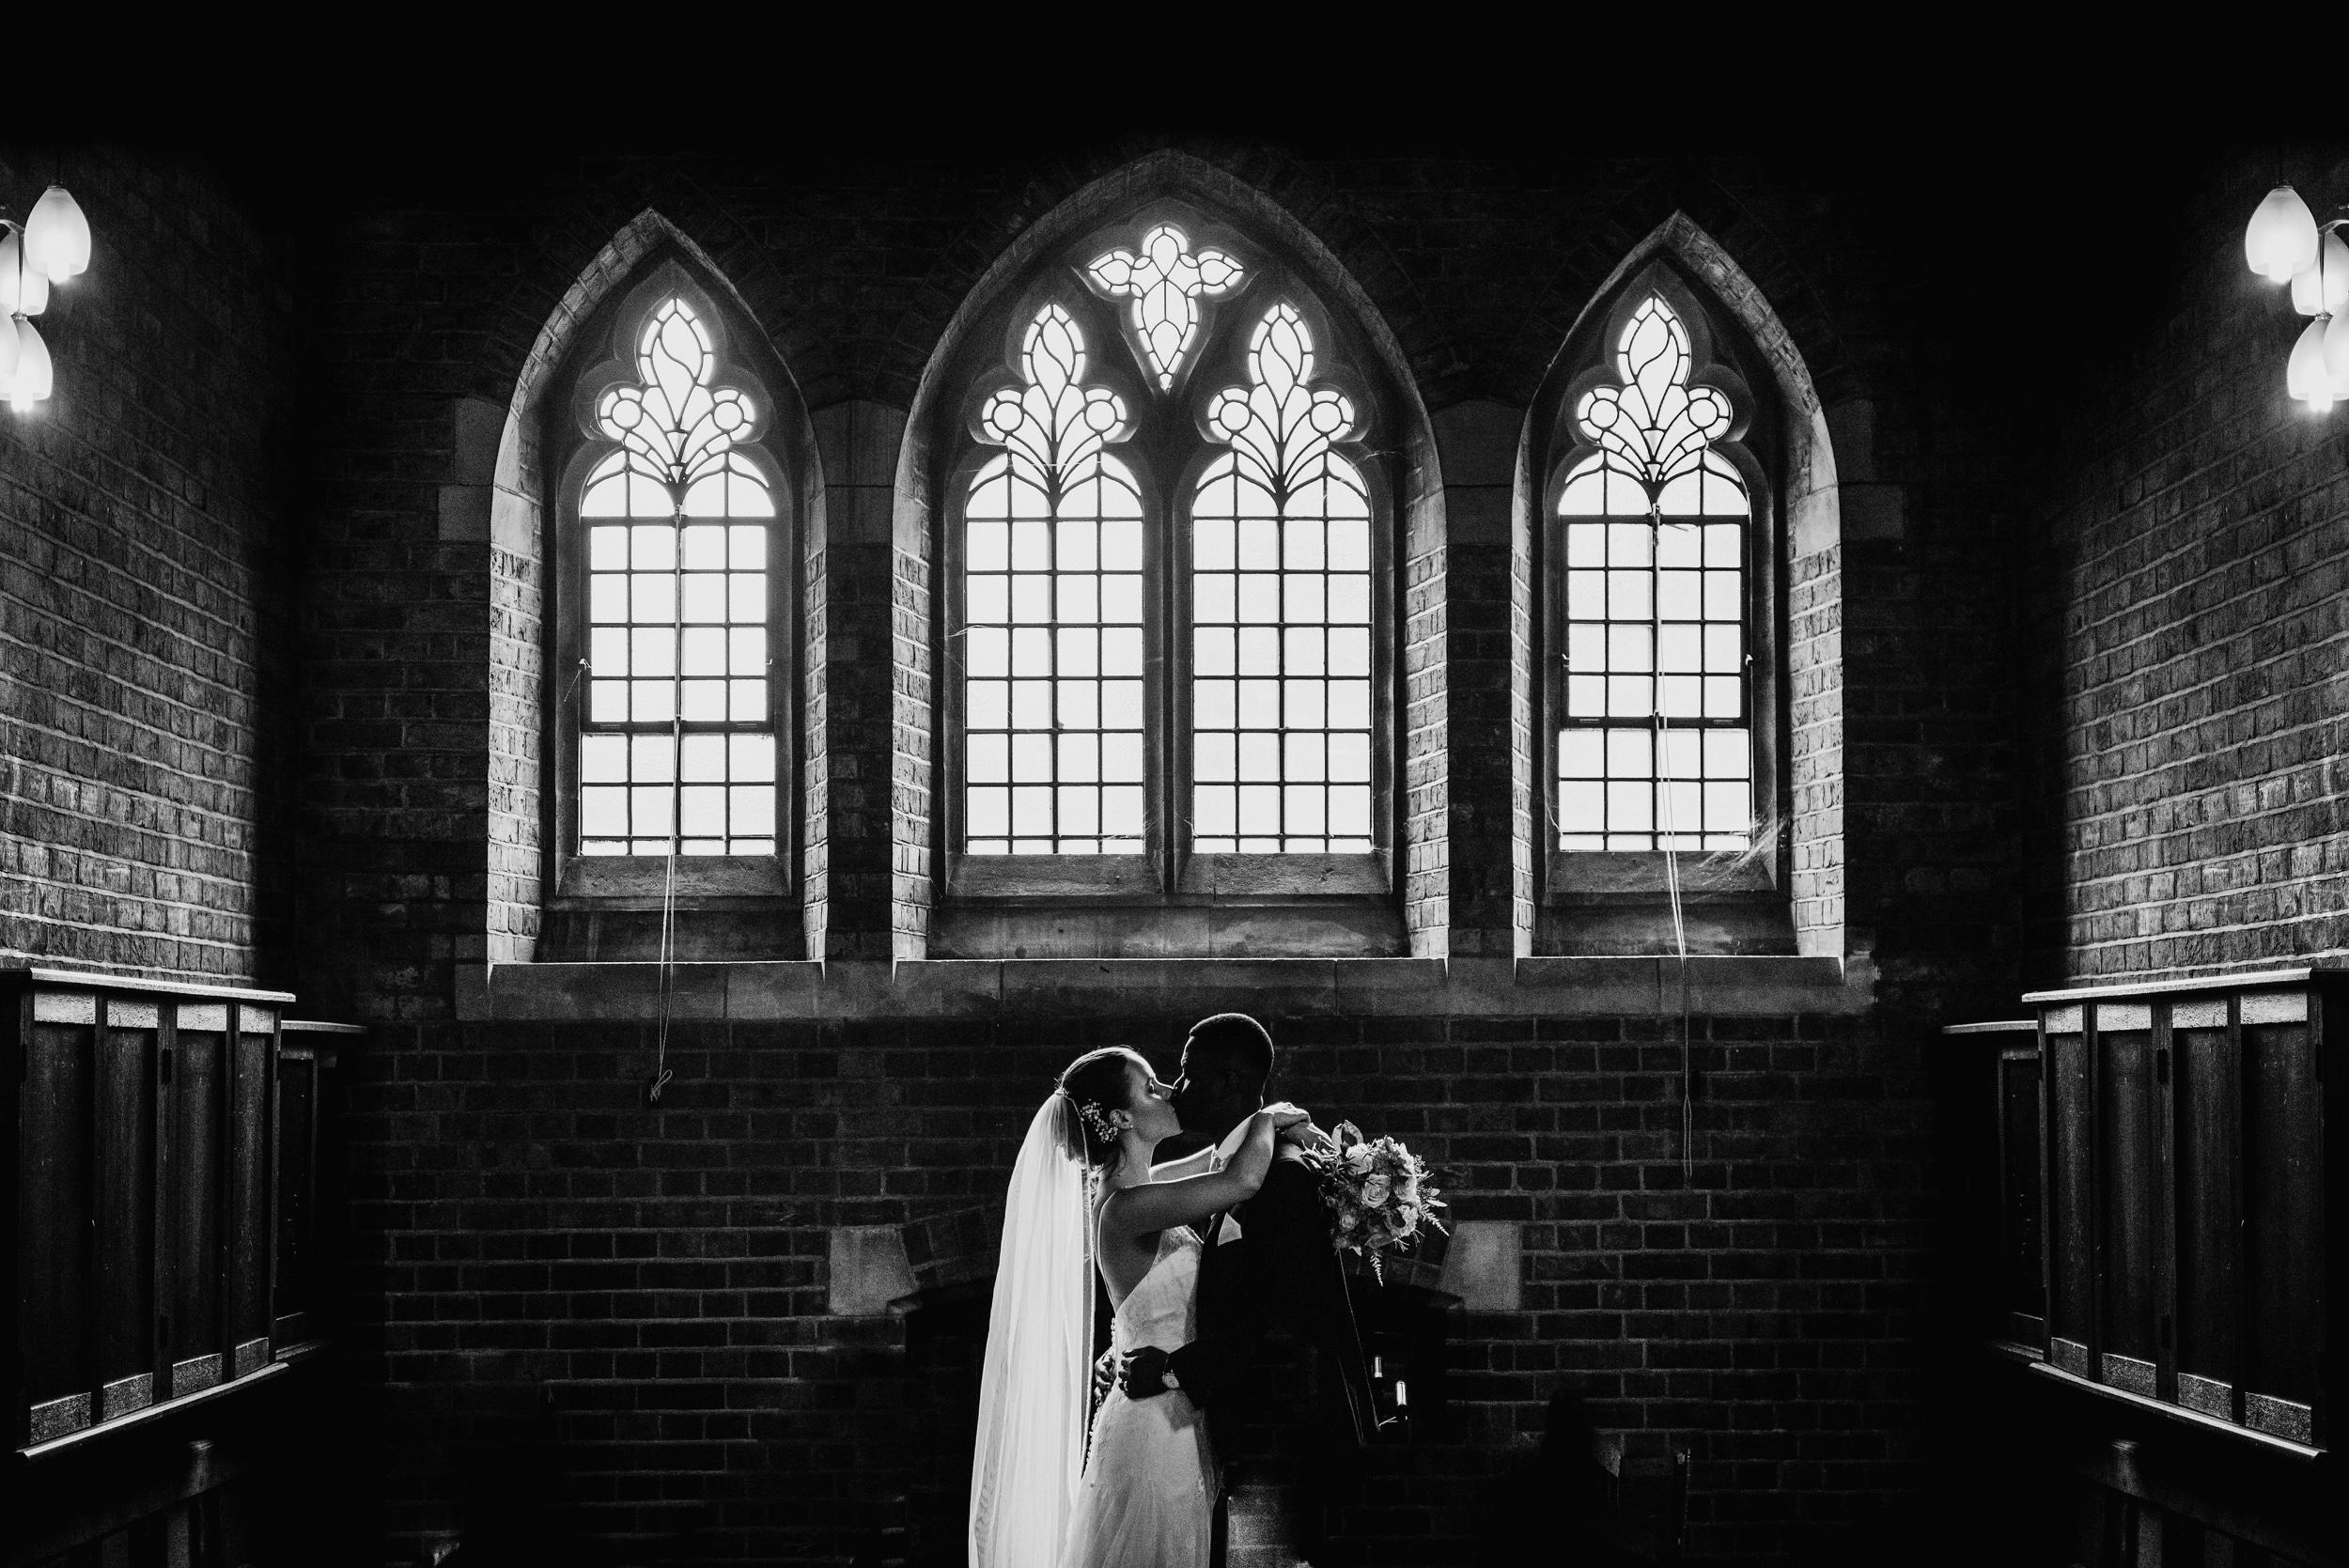 David Scholes Lancashire wedding photography 2016-29.jpg